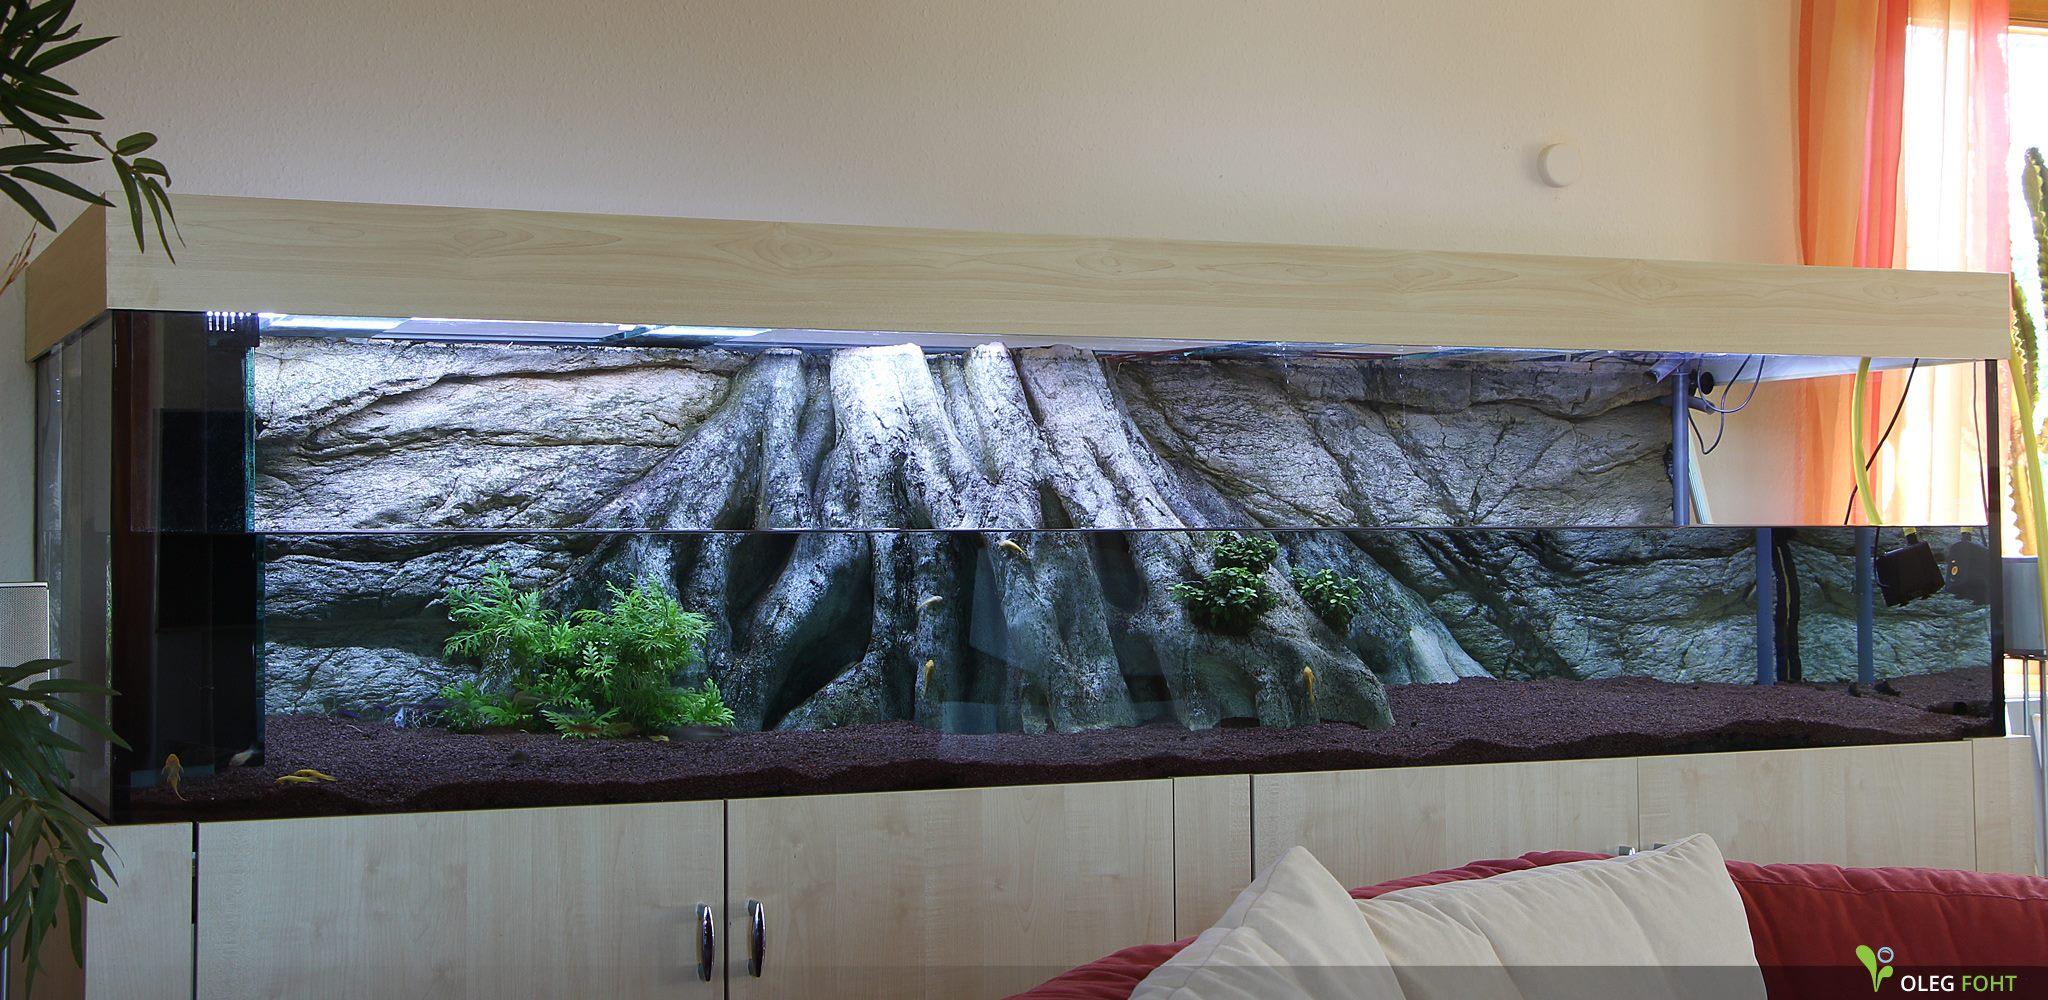 Amazonas XL im Aquarium - Anfang der Dekoration